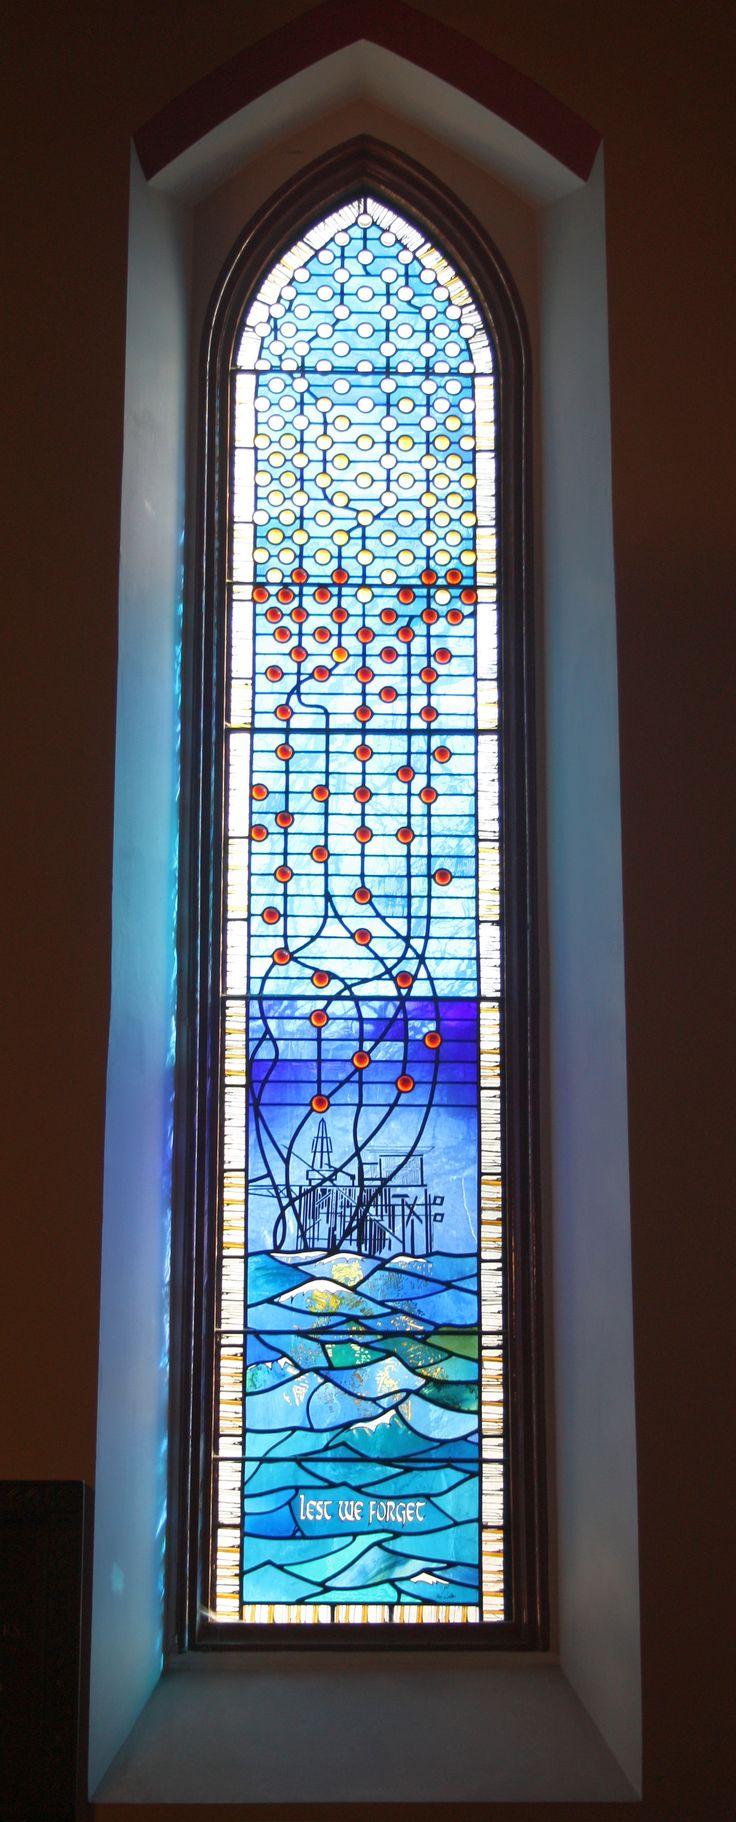 Souls rise to heaven -- File:The Piper Alpha Window, Ferryhill Church, Aberdeen - geograph.org.uk - 1801868.jpg